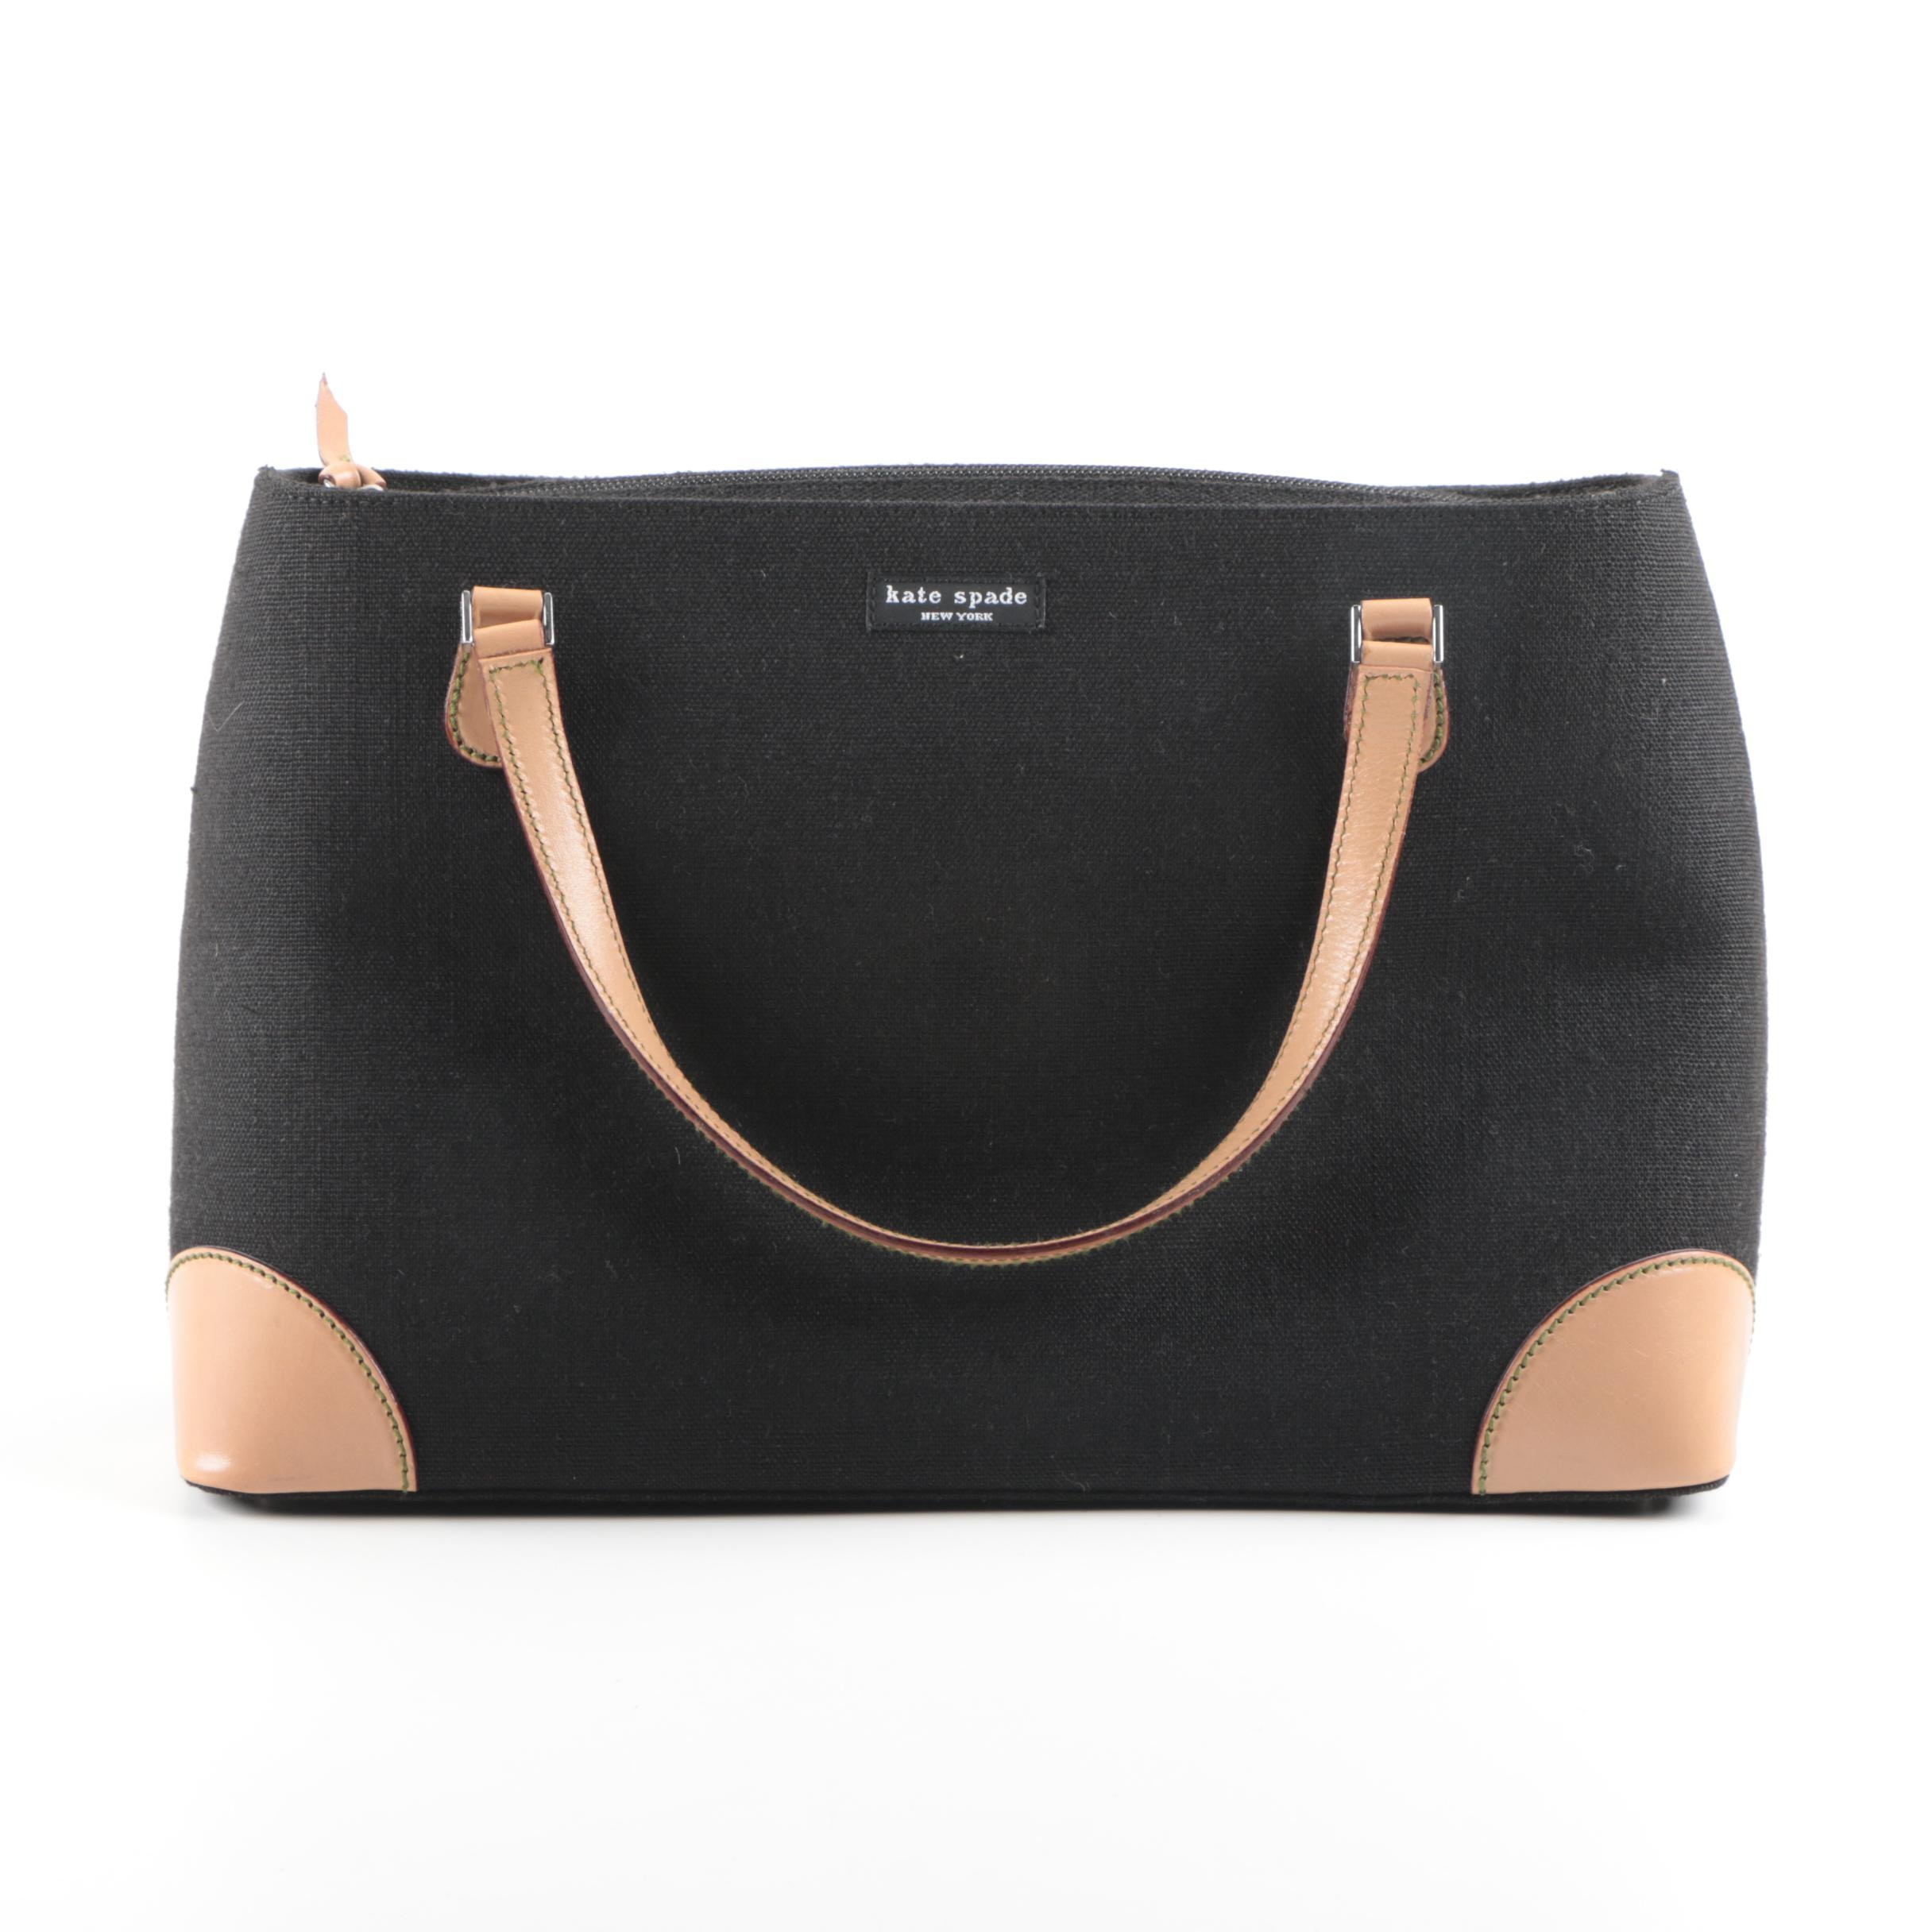 Kate Spade Black Canvas and Tan Leather Handbag